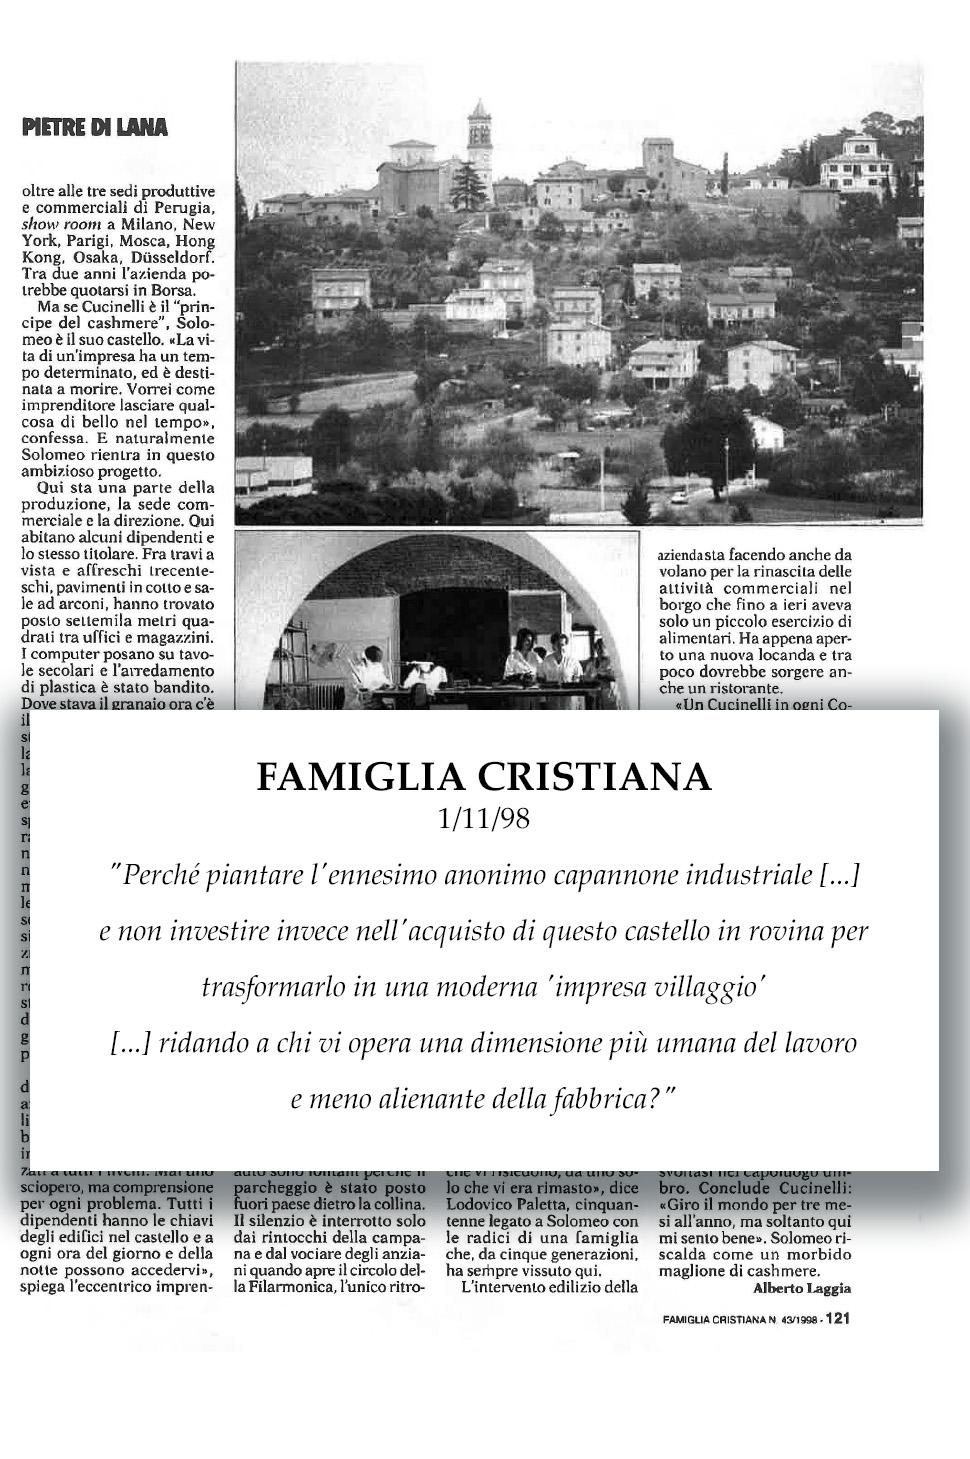 1998 Famiglia Cristiana